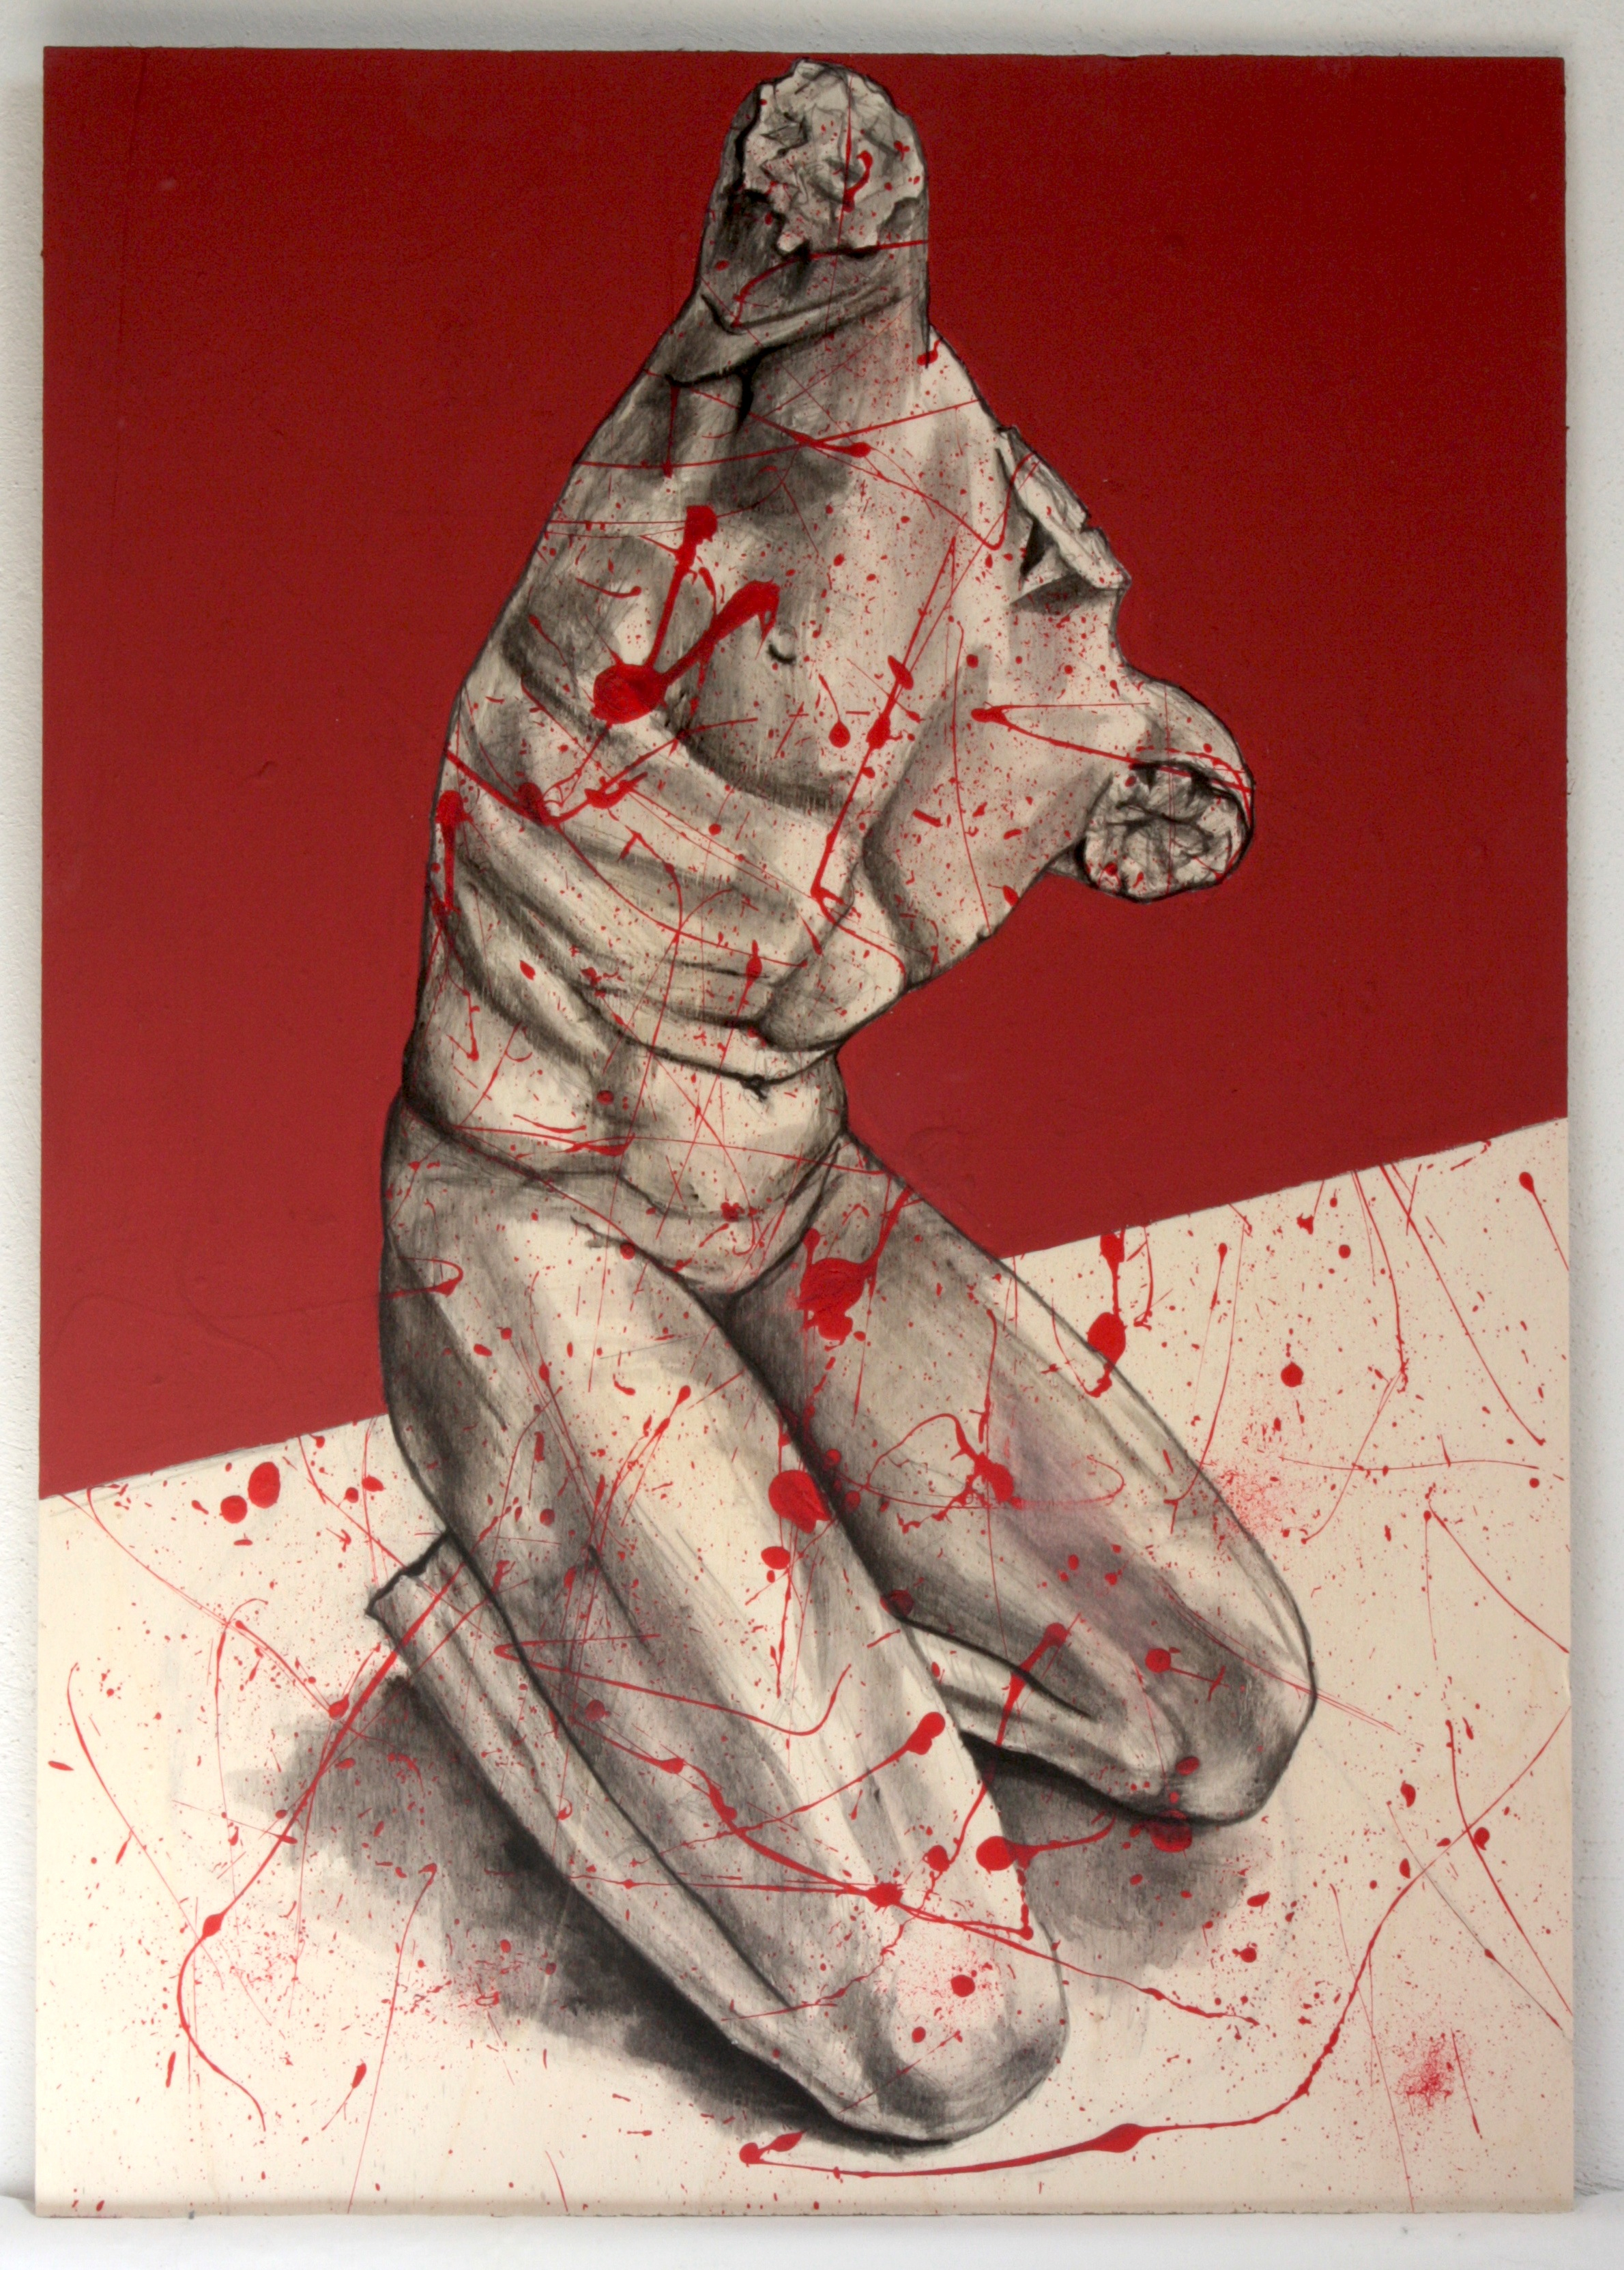 Pollock'd, Missing Limbs